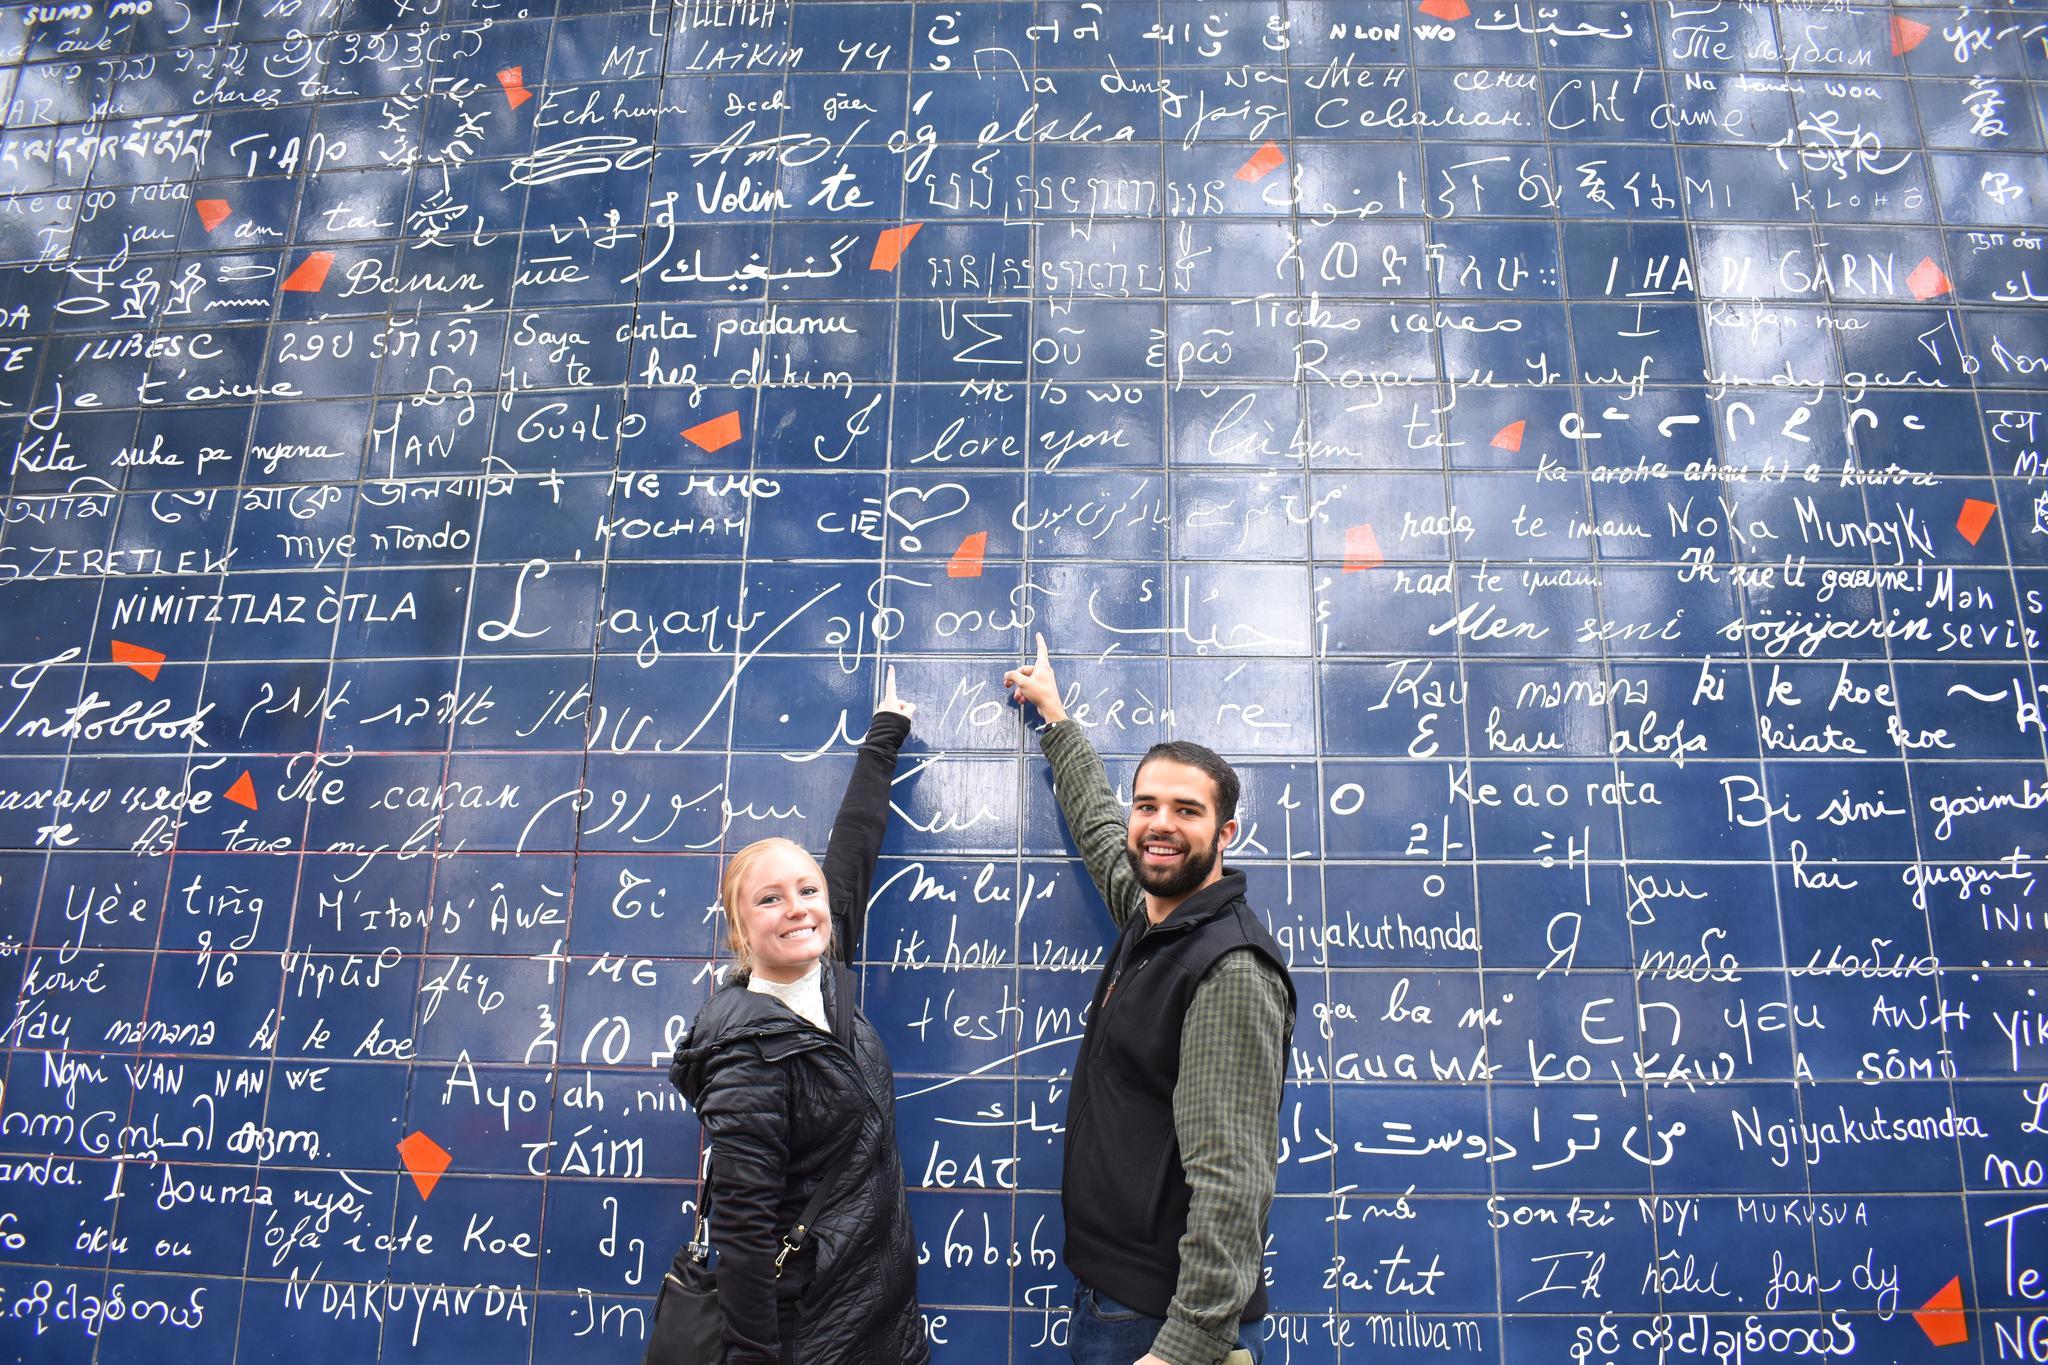 Wall of Love - Paris, France